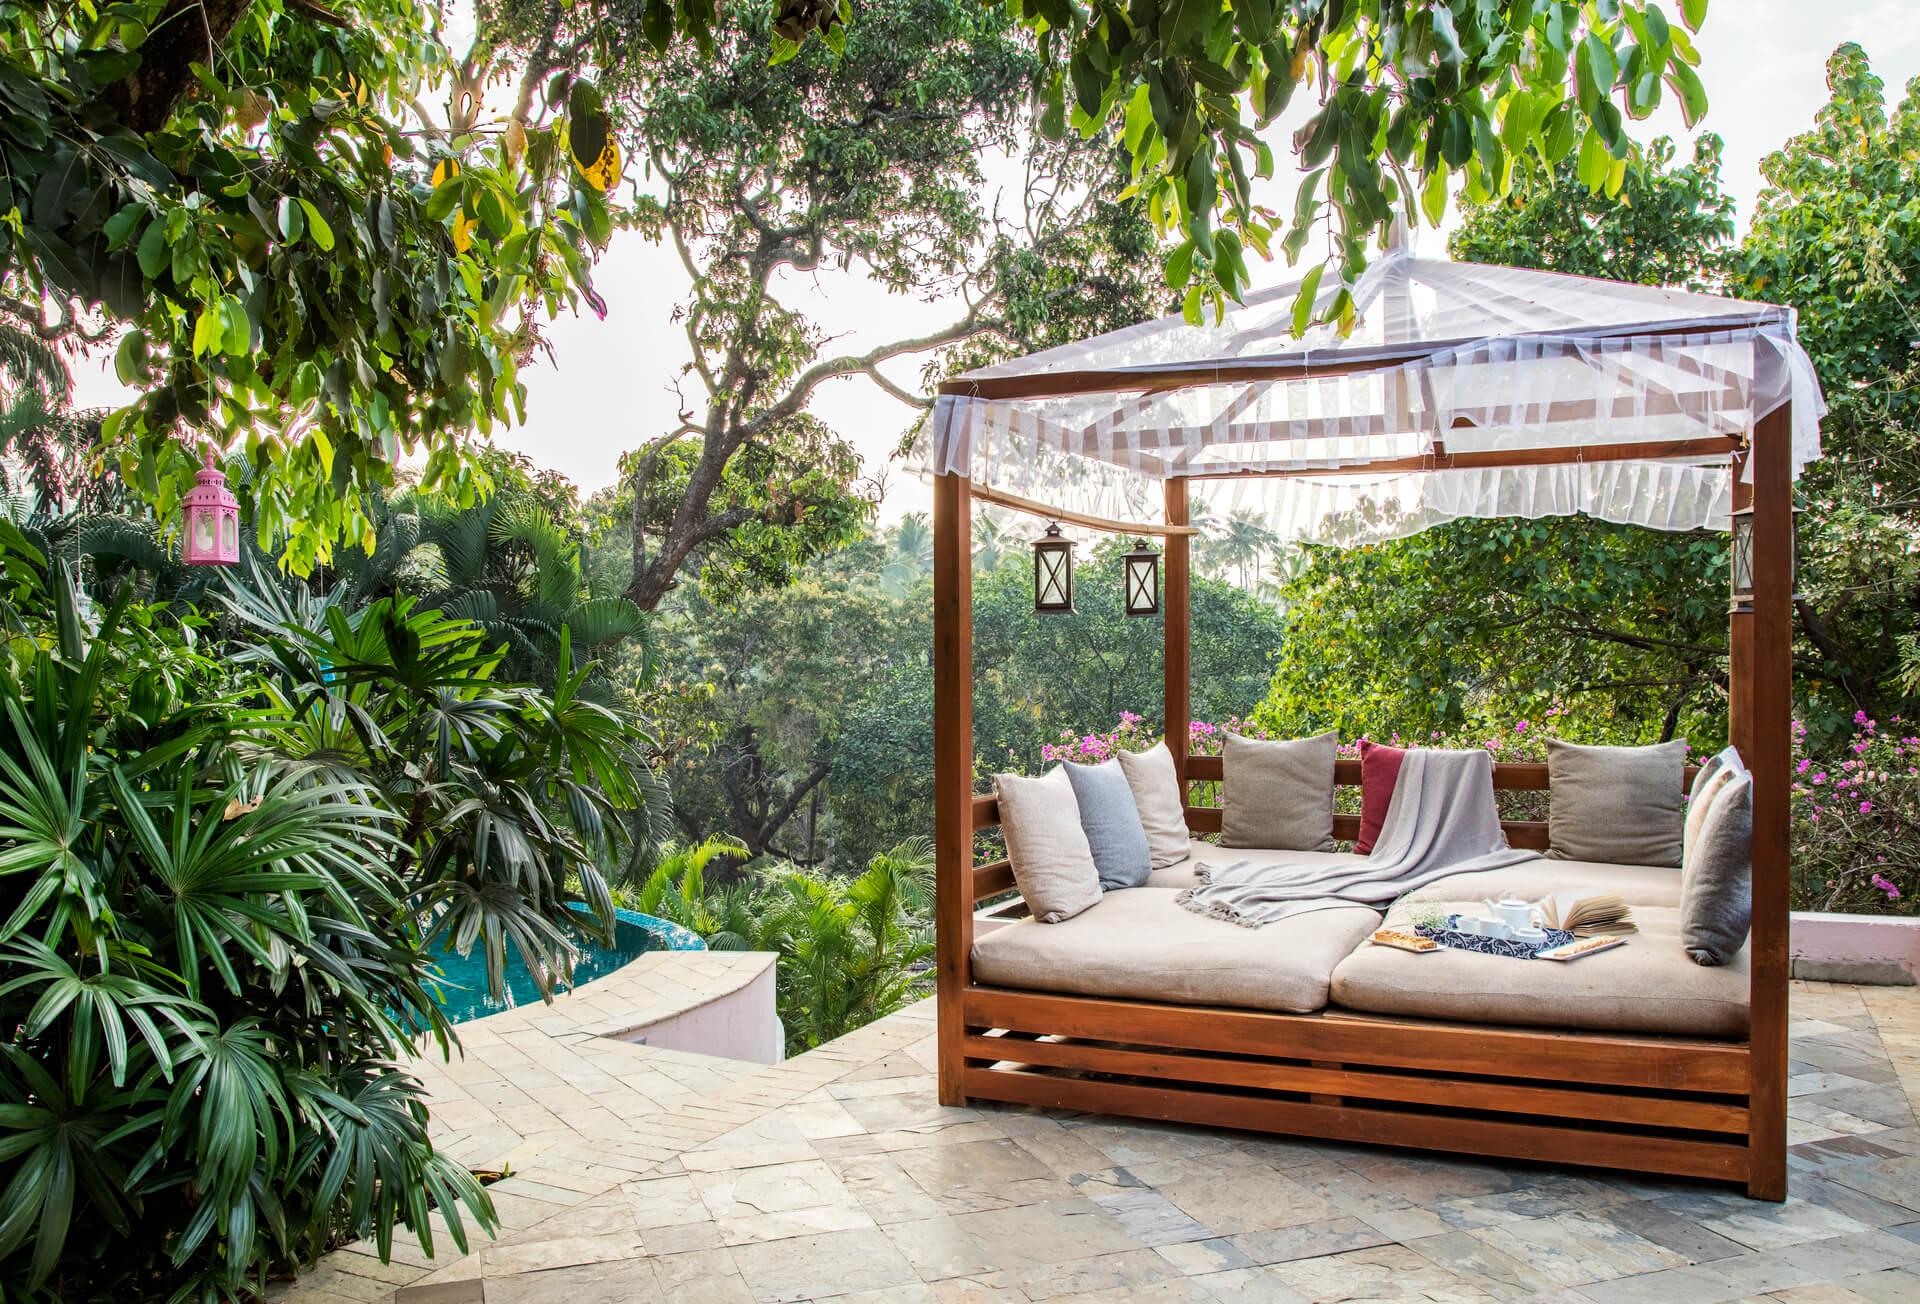 Rainbowtree - Private bungalow in Anjuna, Goa